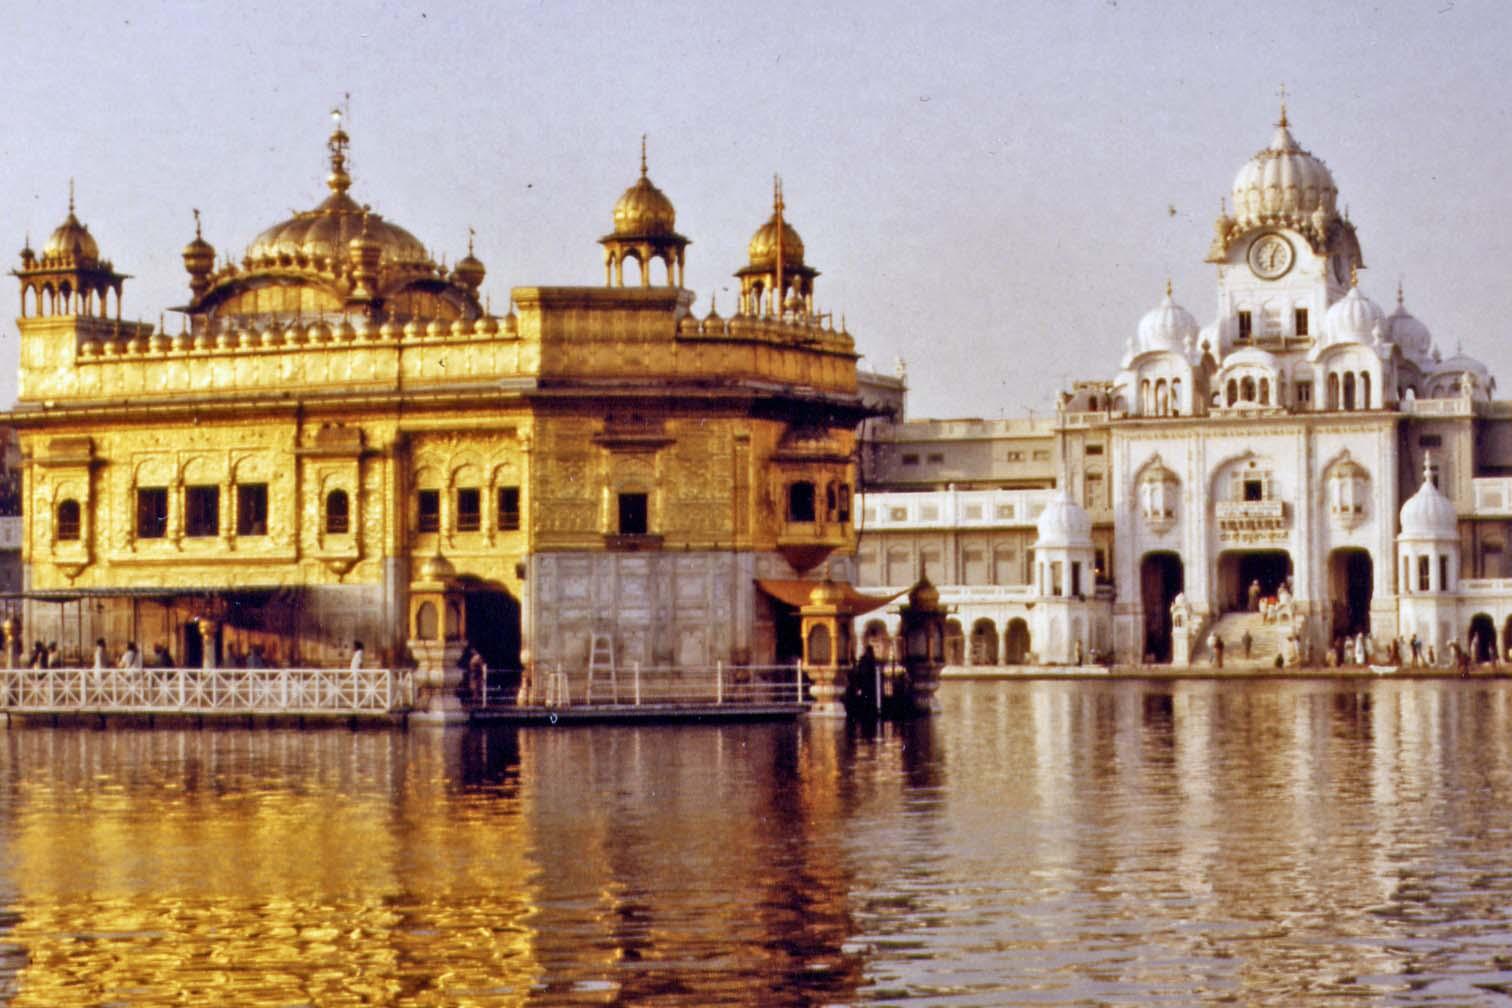 Golden Temple in Amritsar, India 1983